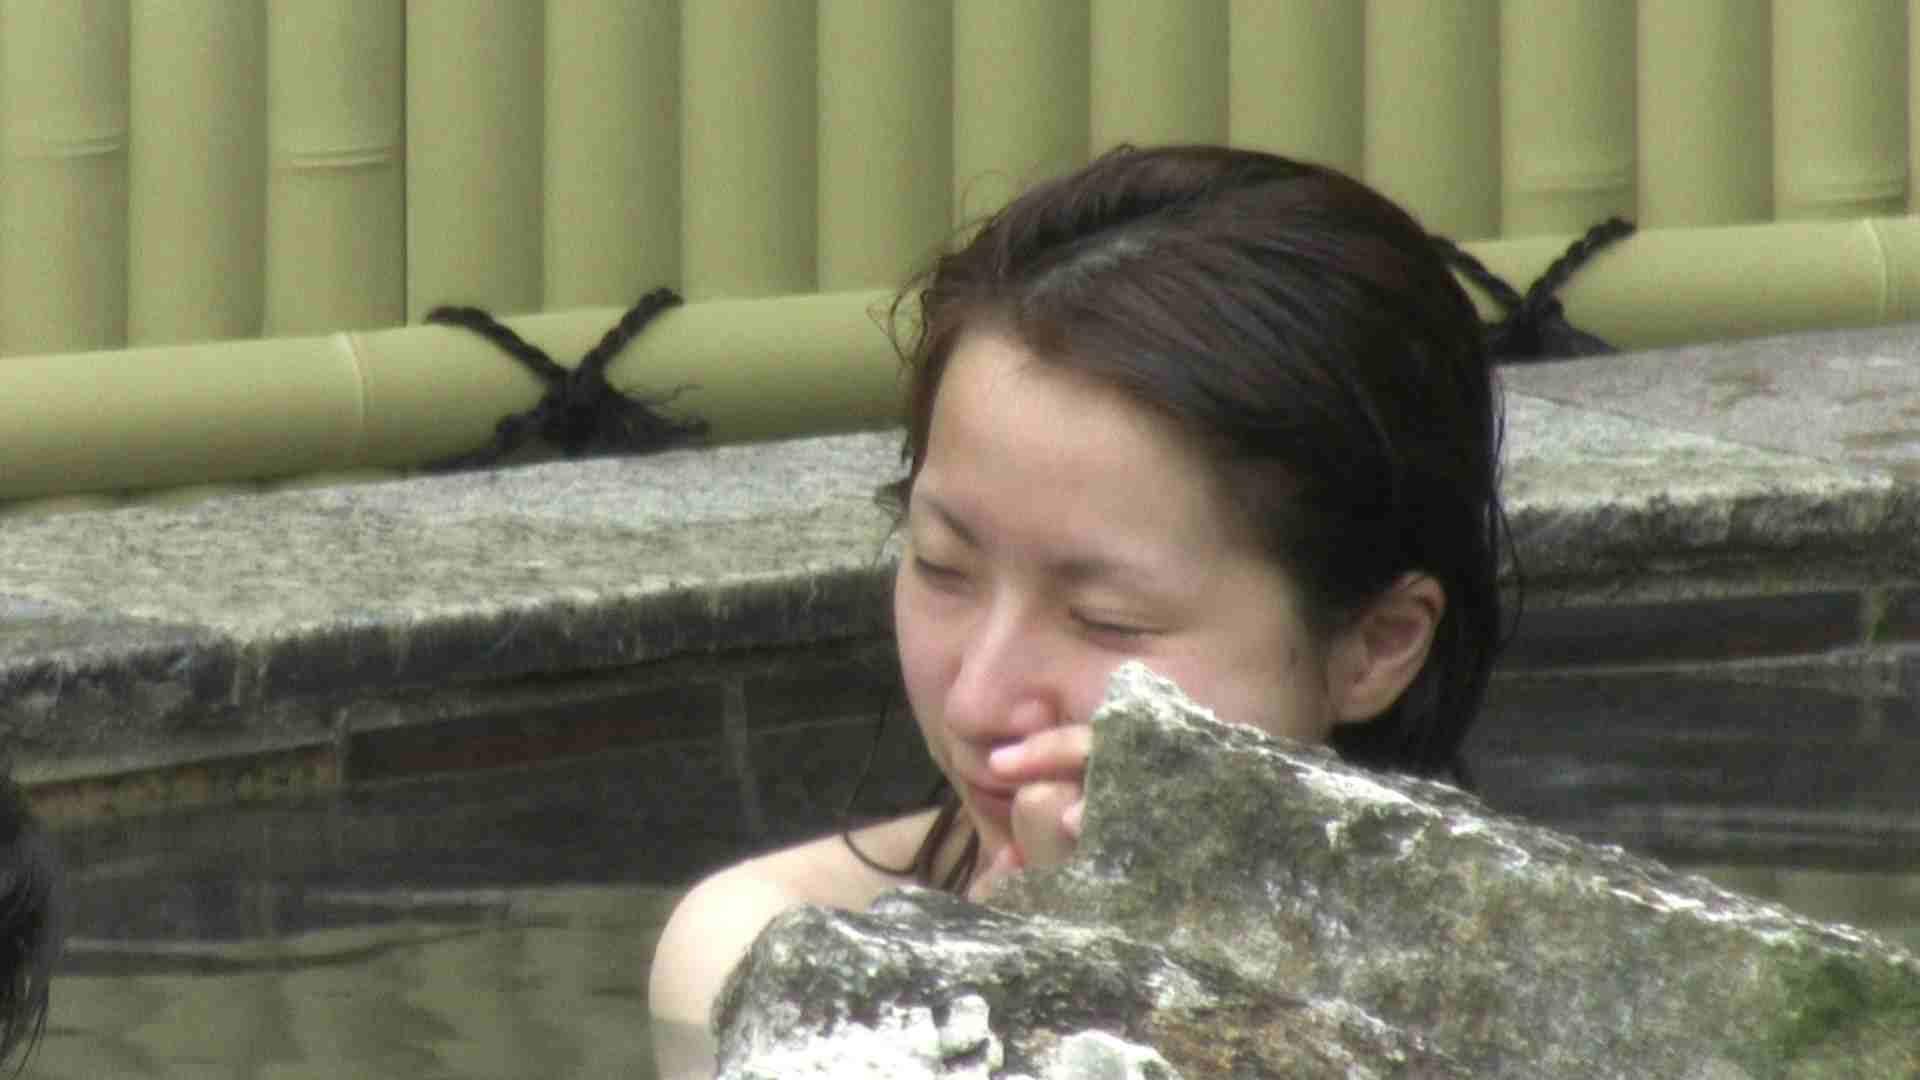 Aquaな露天風呂Vol.181 OLのエロ生活 | 露天風呂  40連発 13